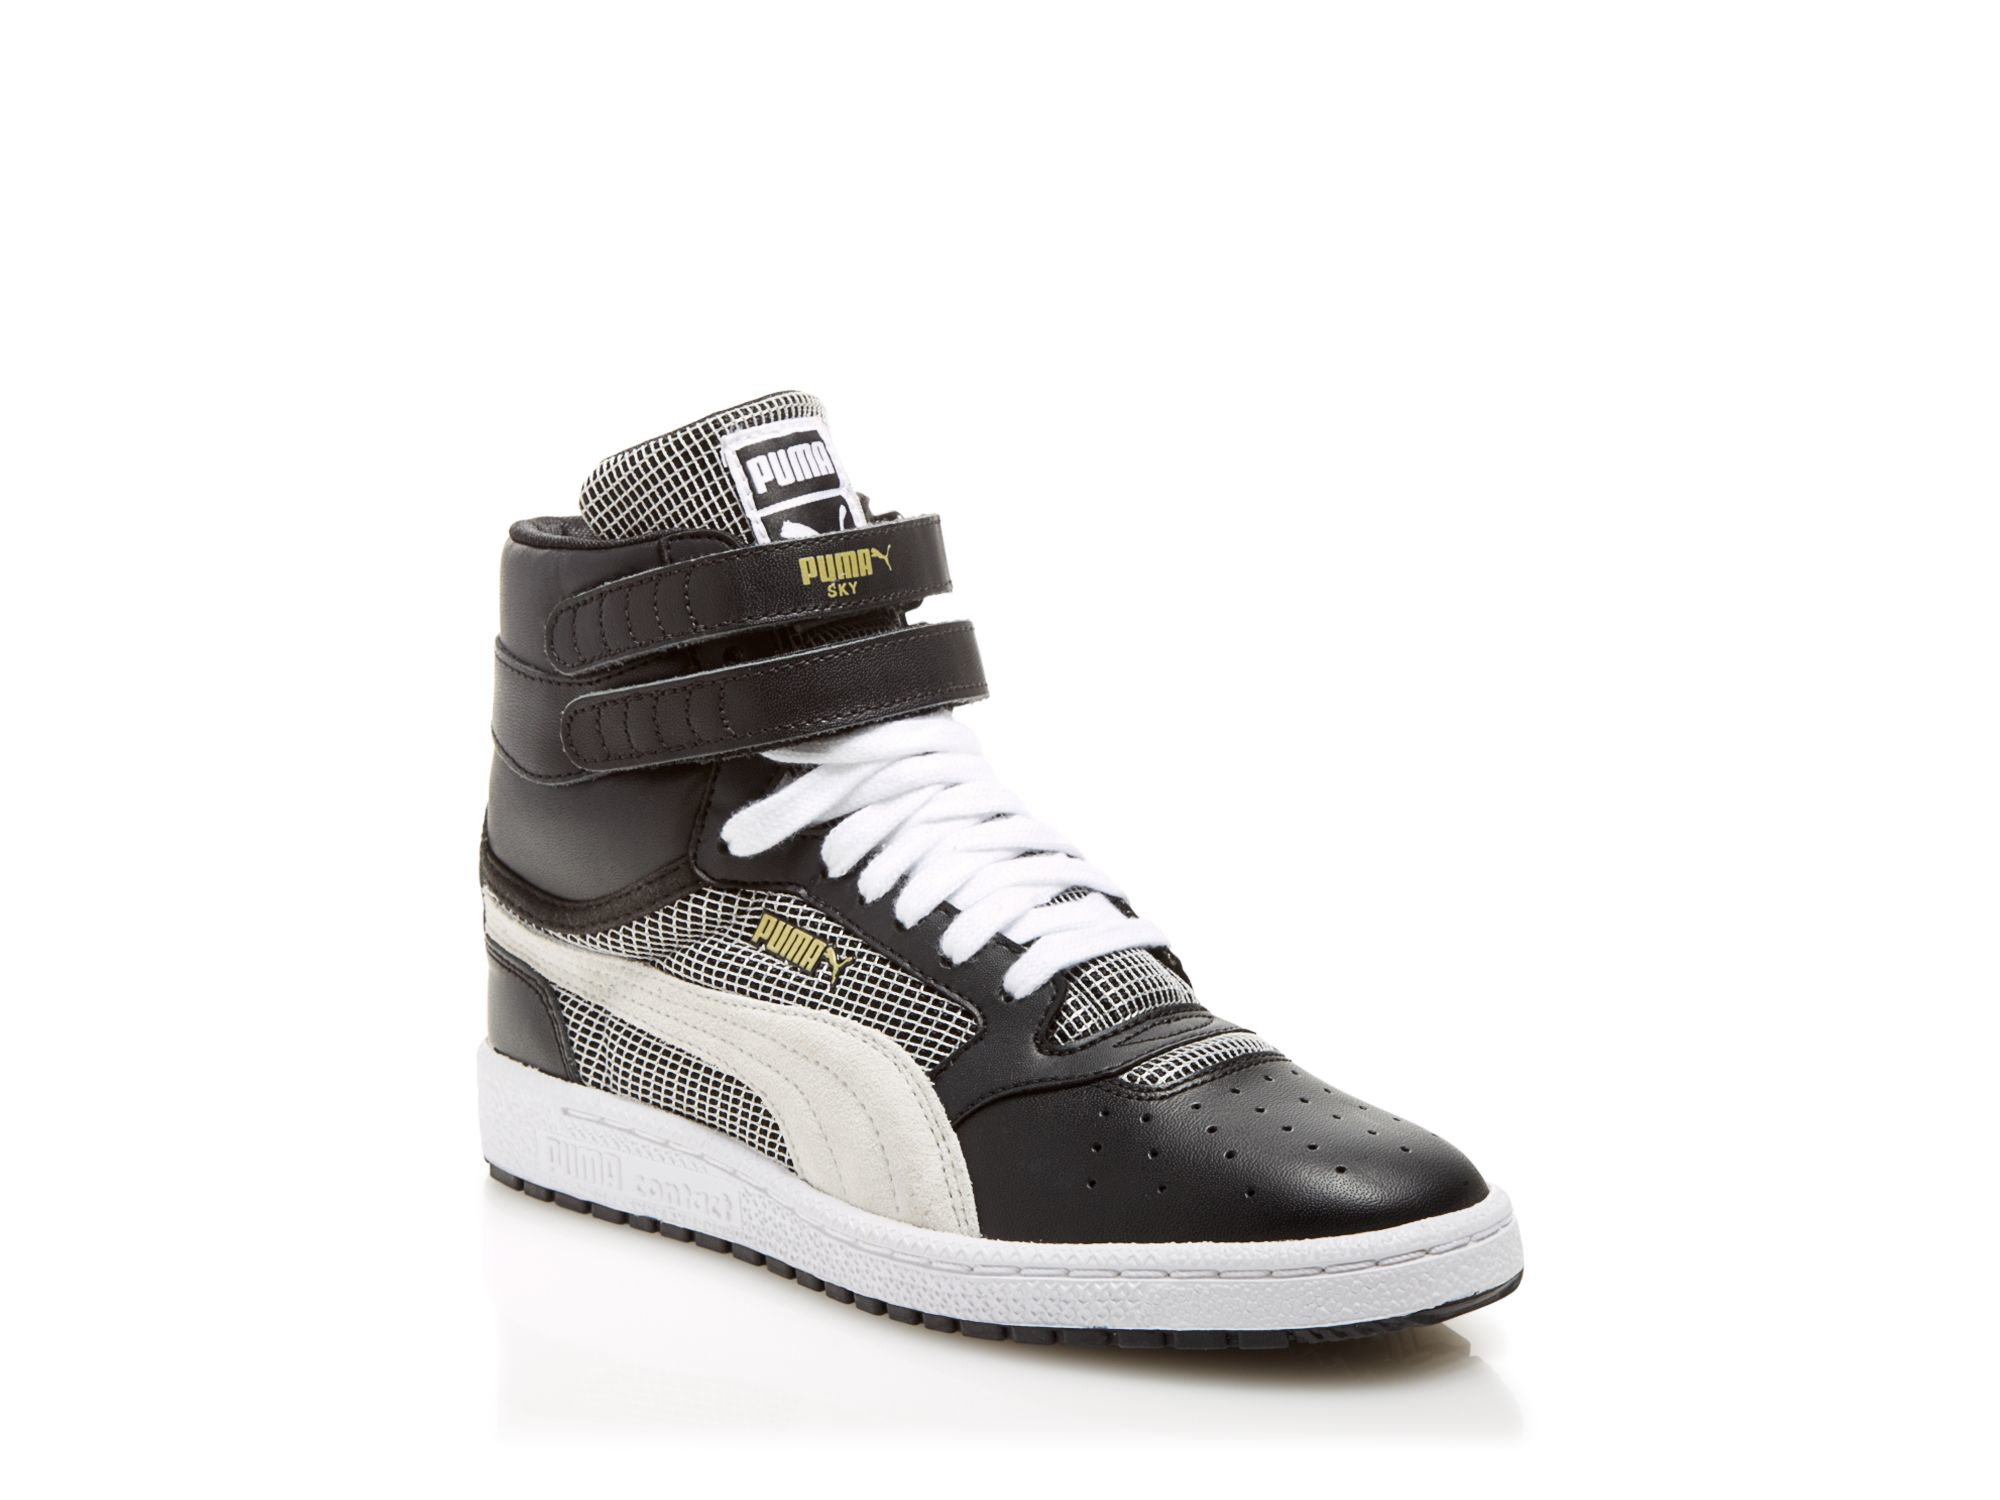 Puma high top sneakers sky ii hi blocks amp stripes in black lyst